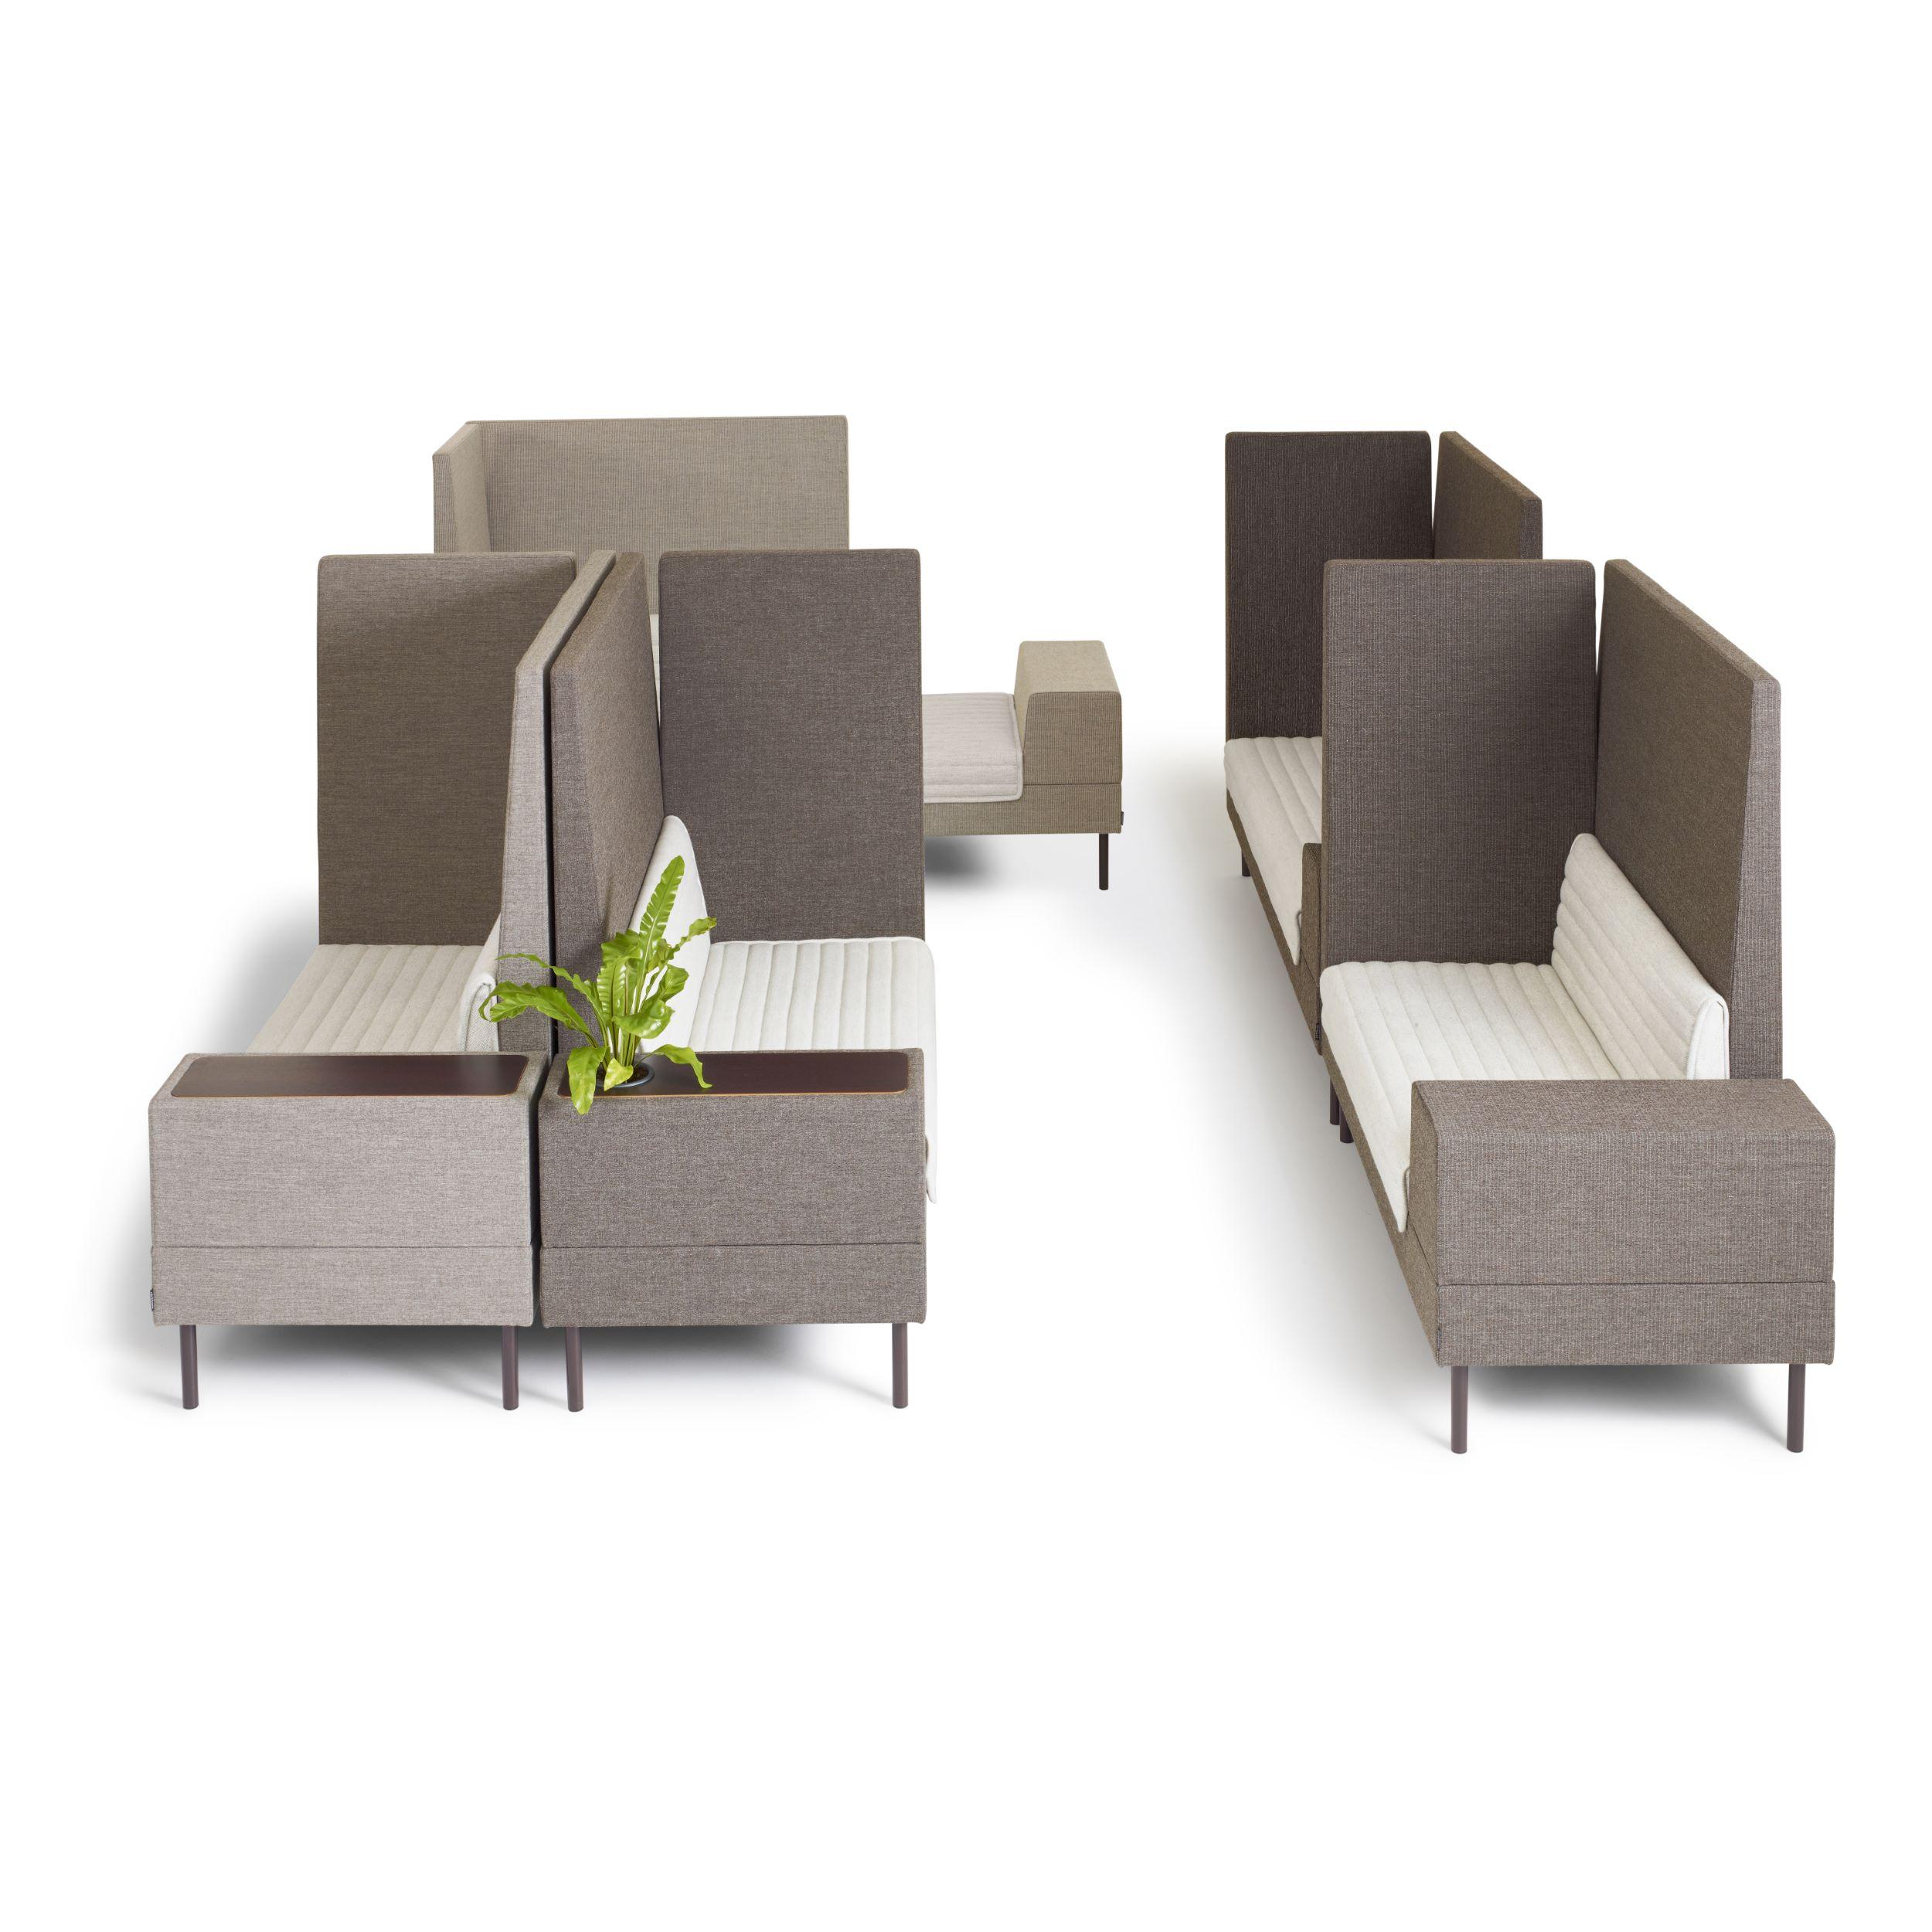 Smallroom Plus 1500 Sofa And Room Separator Ineke